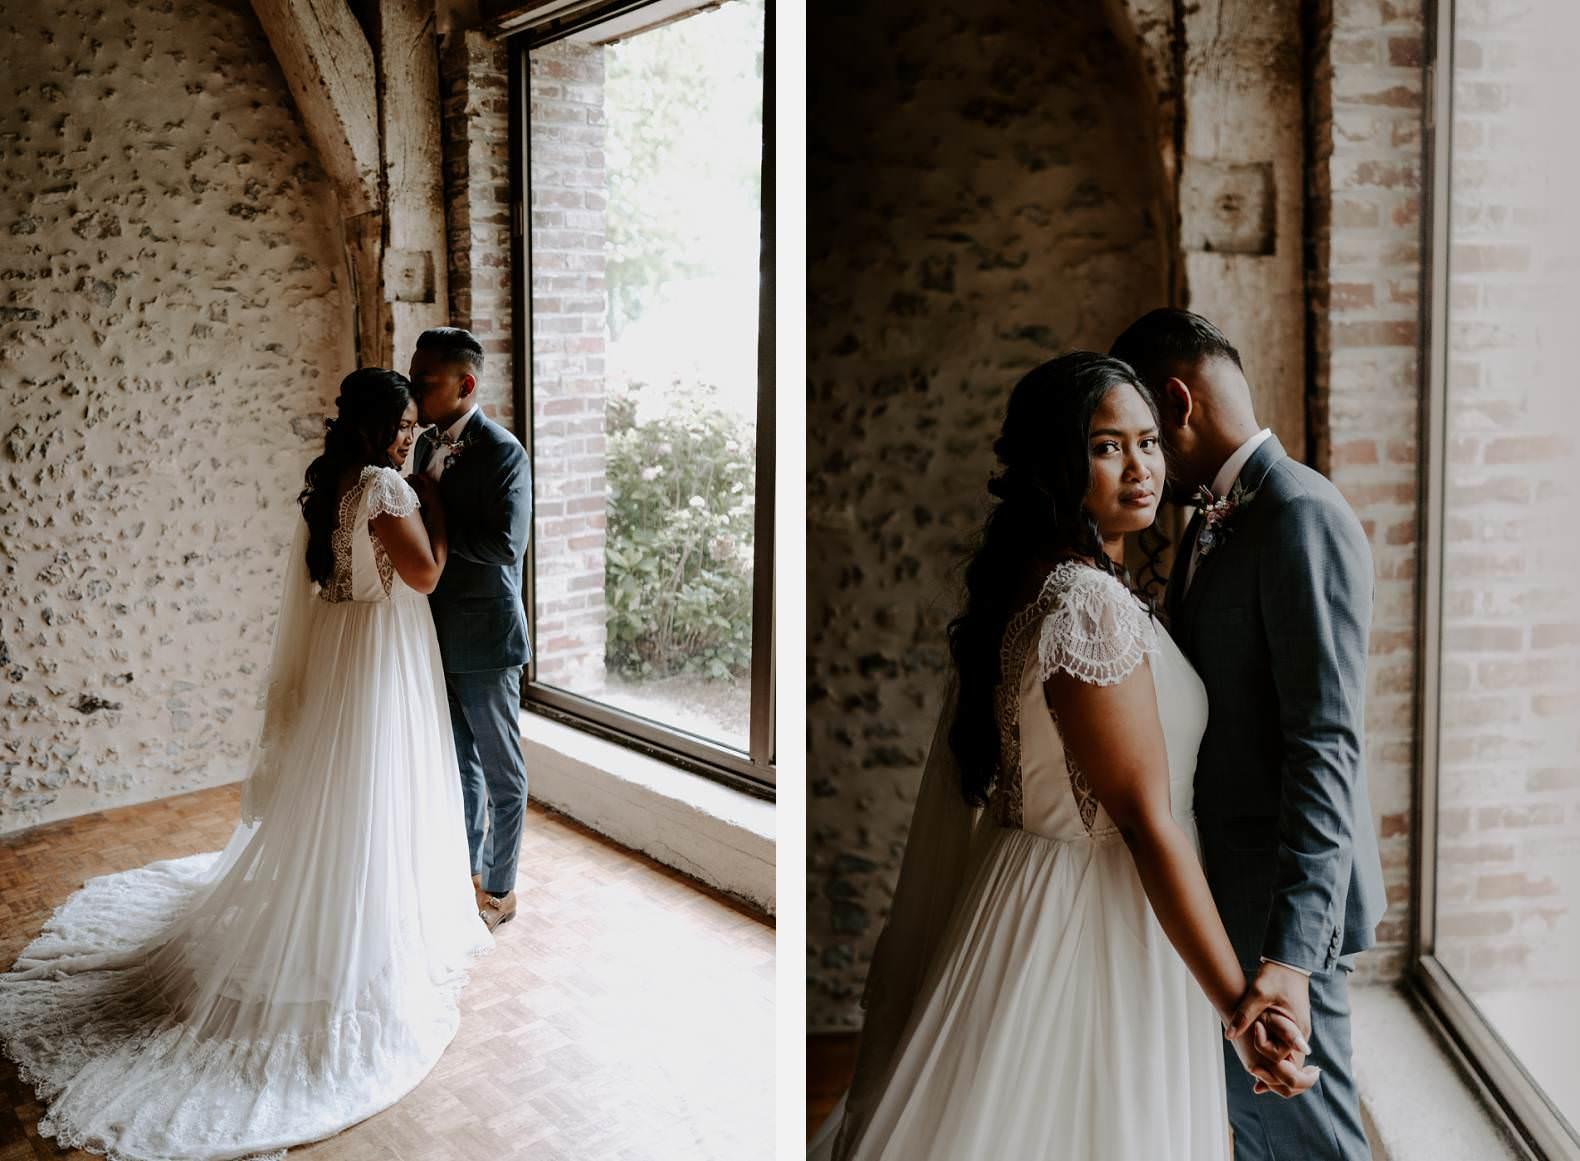 mariage manoir de corny photographe bel esprit 0044 1